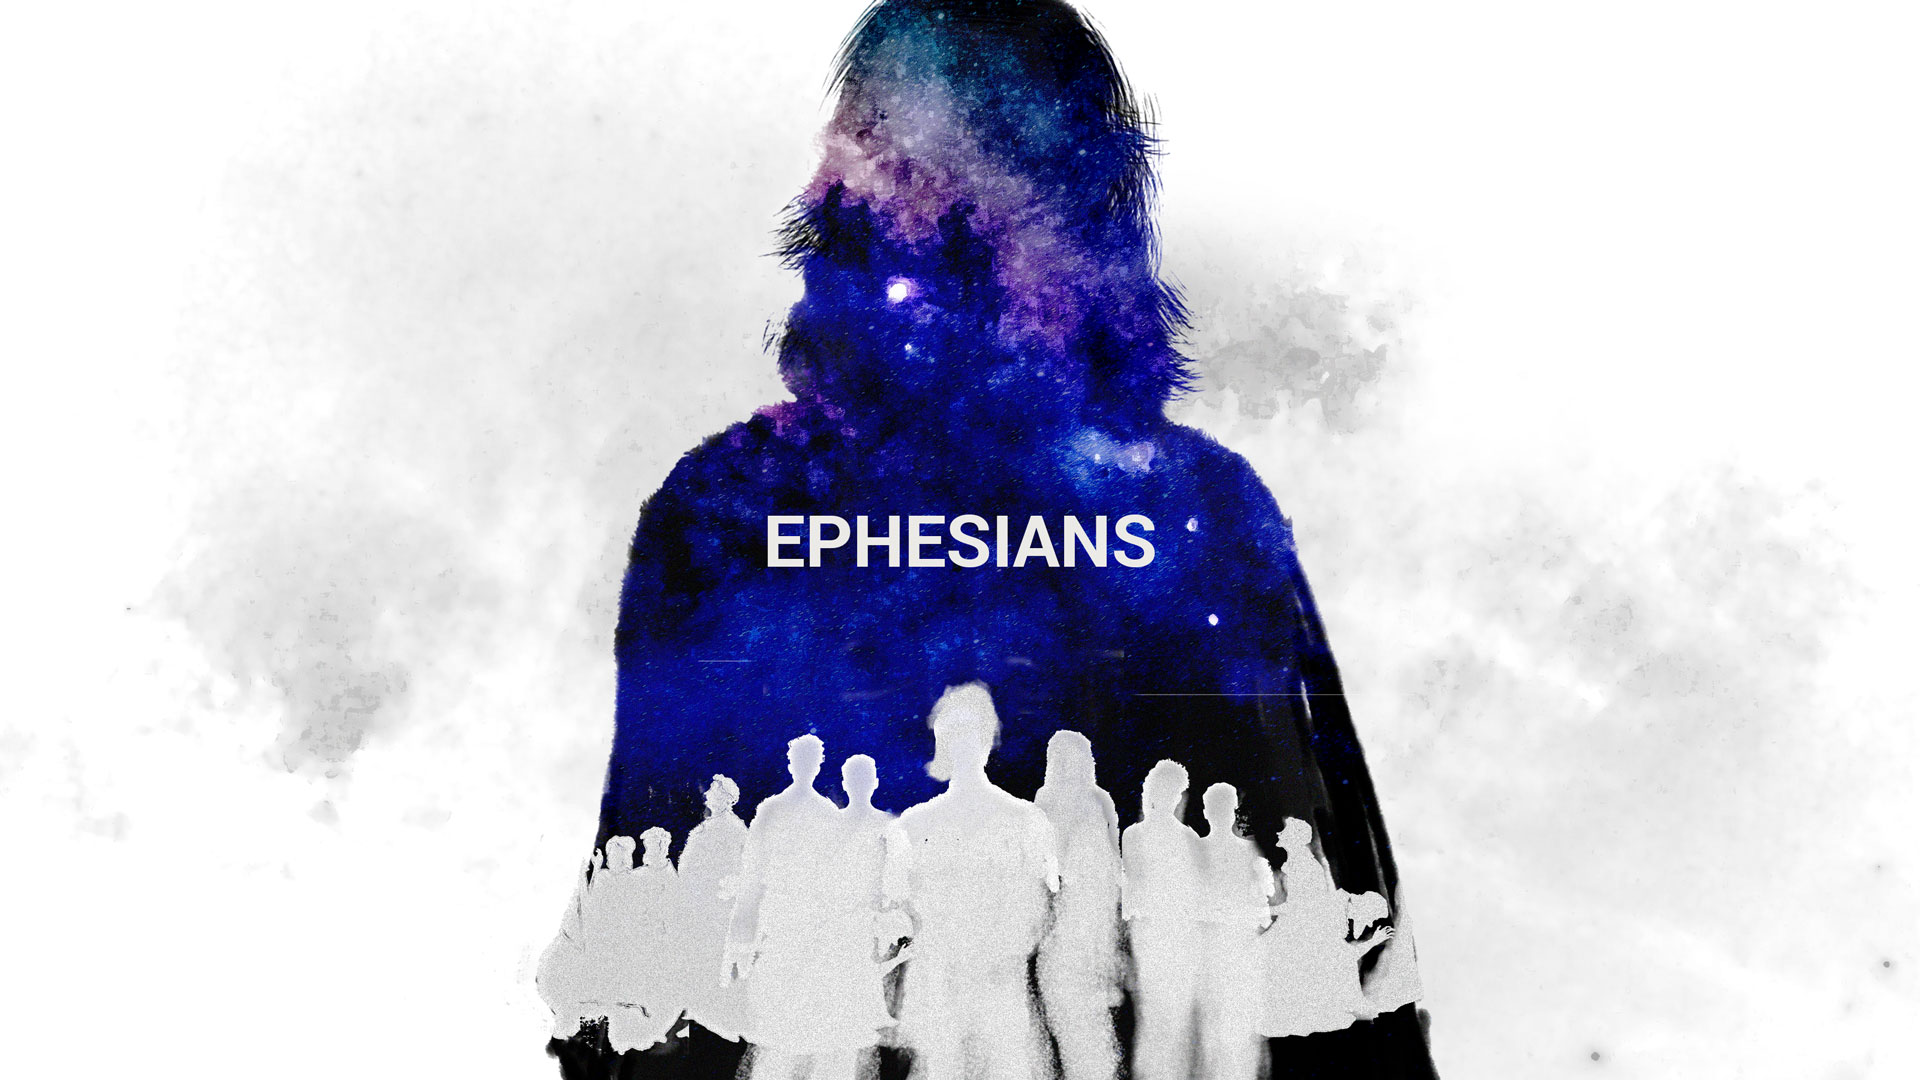 b113f12de05 Ephesians - Part Two  The Church